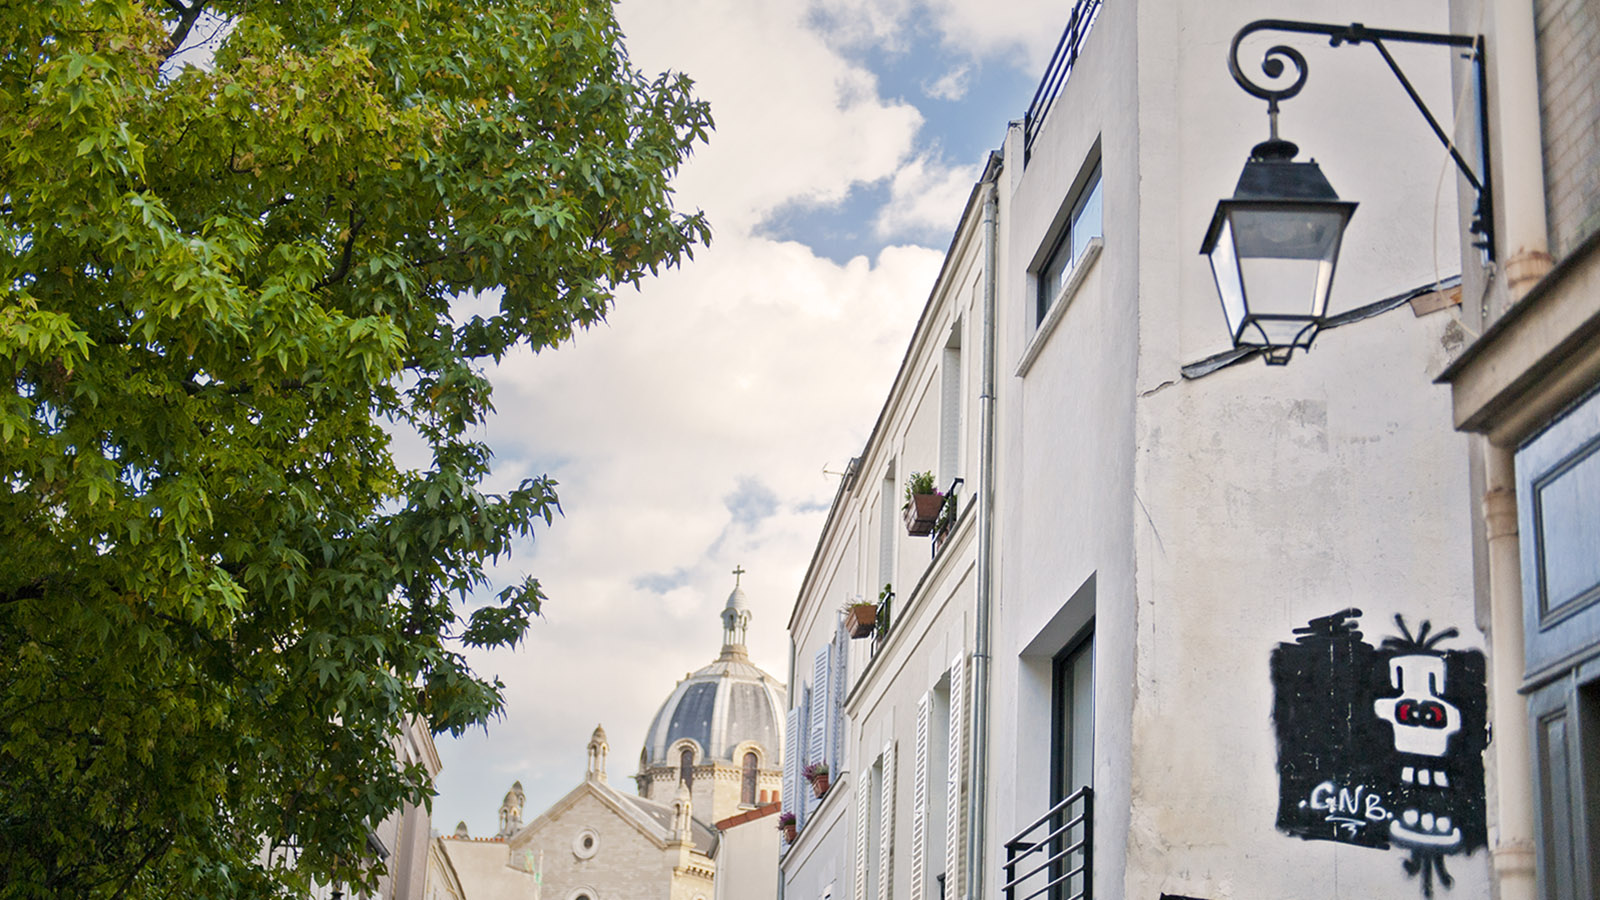 Sainte-Anne de la Butte-aux-Cailles ragt über den Häusern auf. Foto: Hilke Maunder